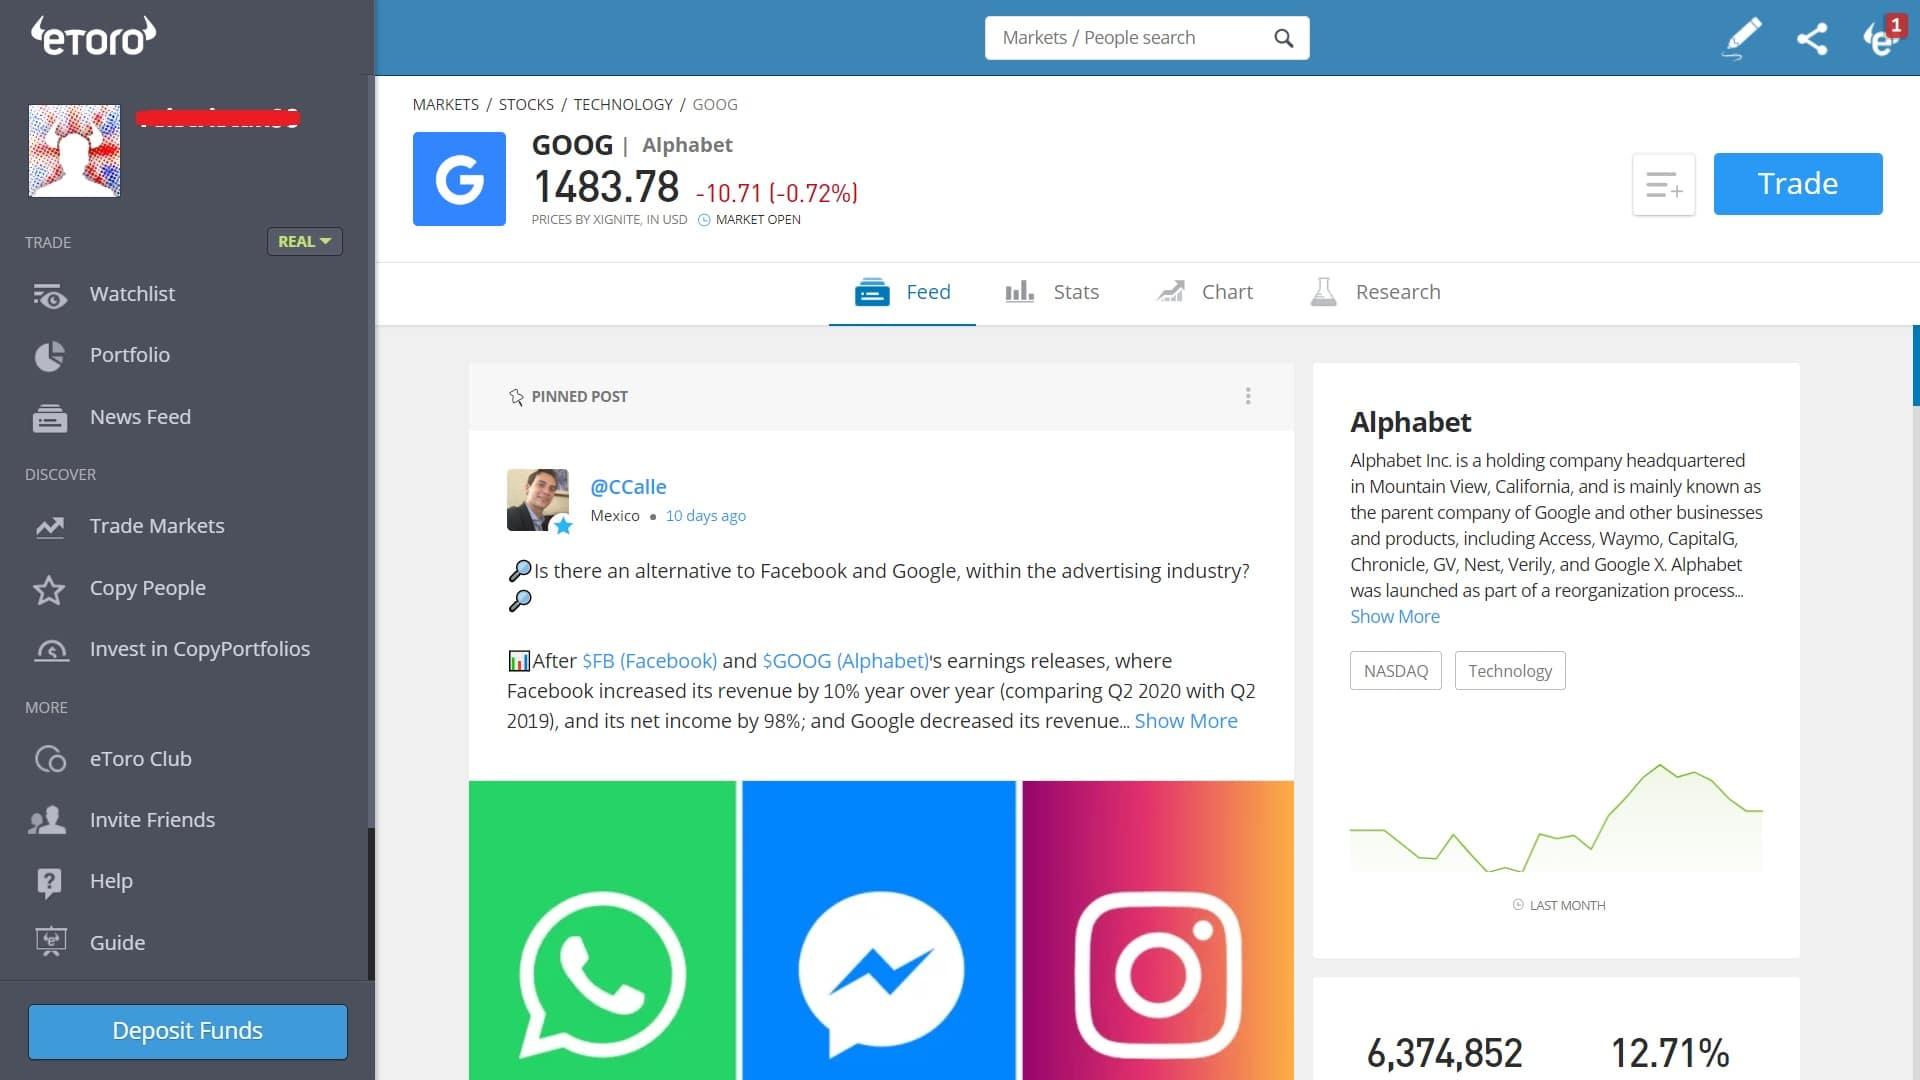 Google stock trading on eToro's platform